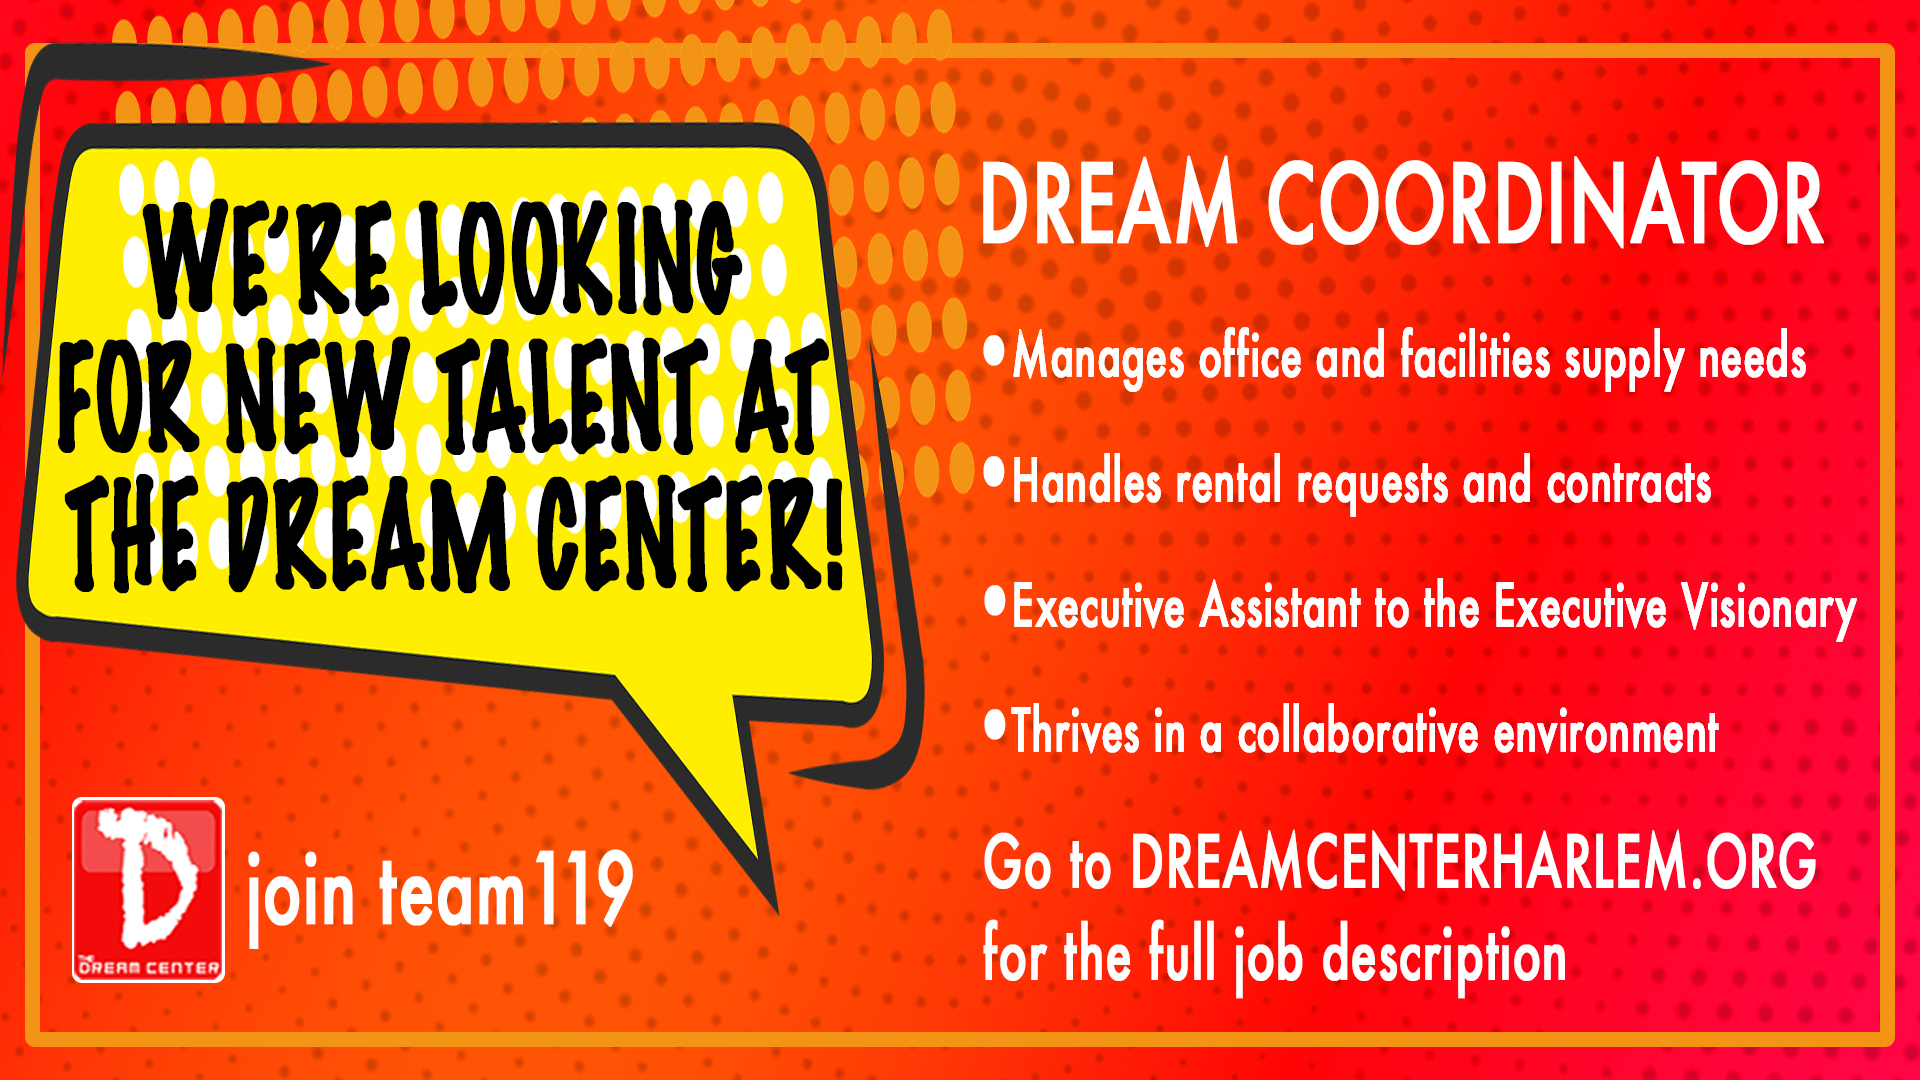 DreamCoordinator_Job-FCBC_Format_Rotator_V2